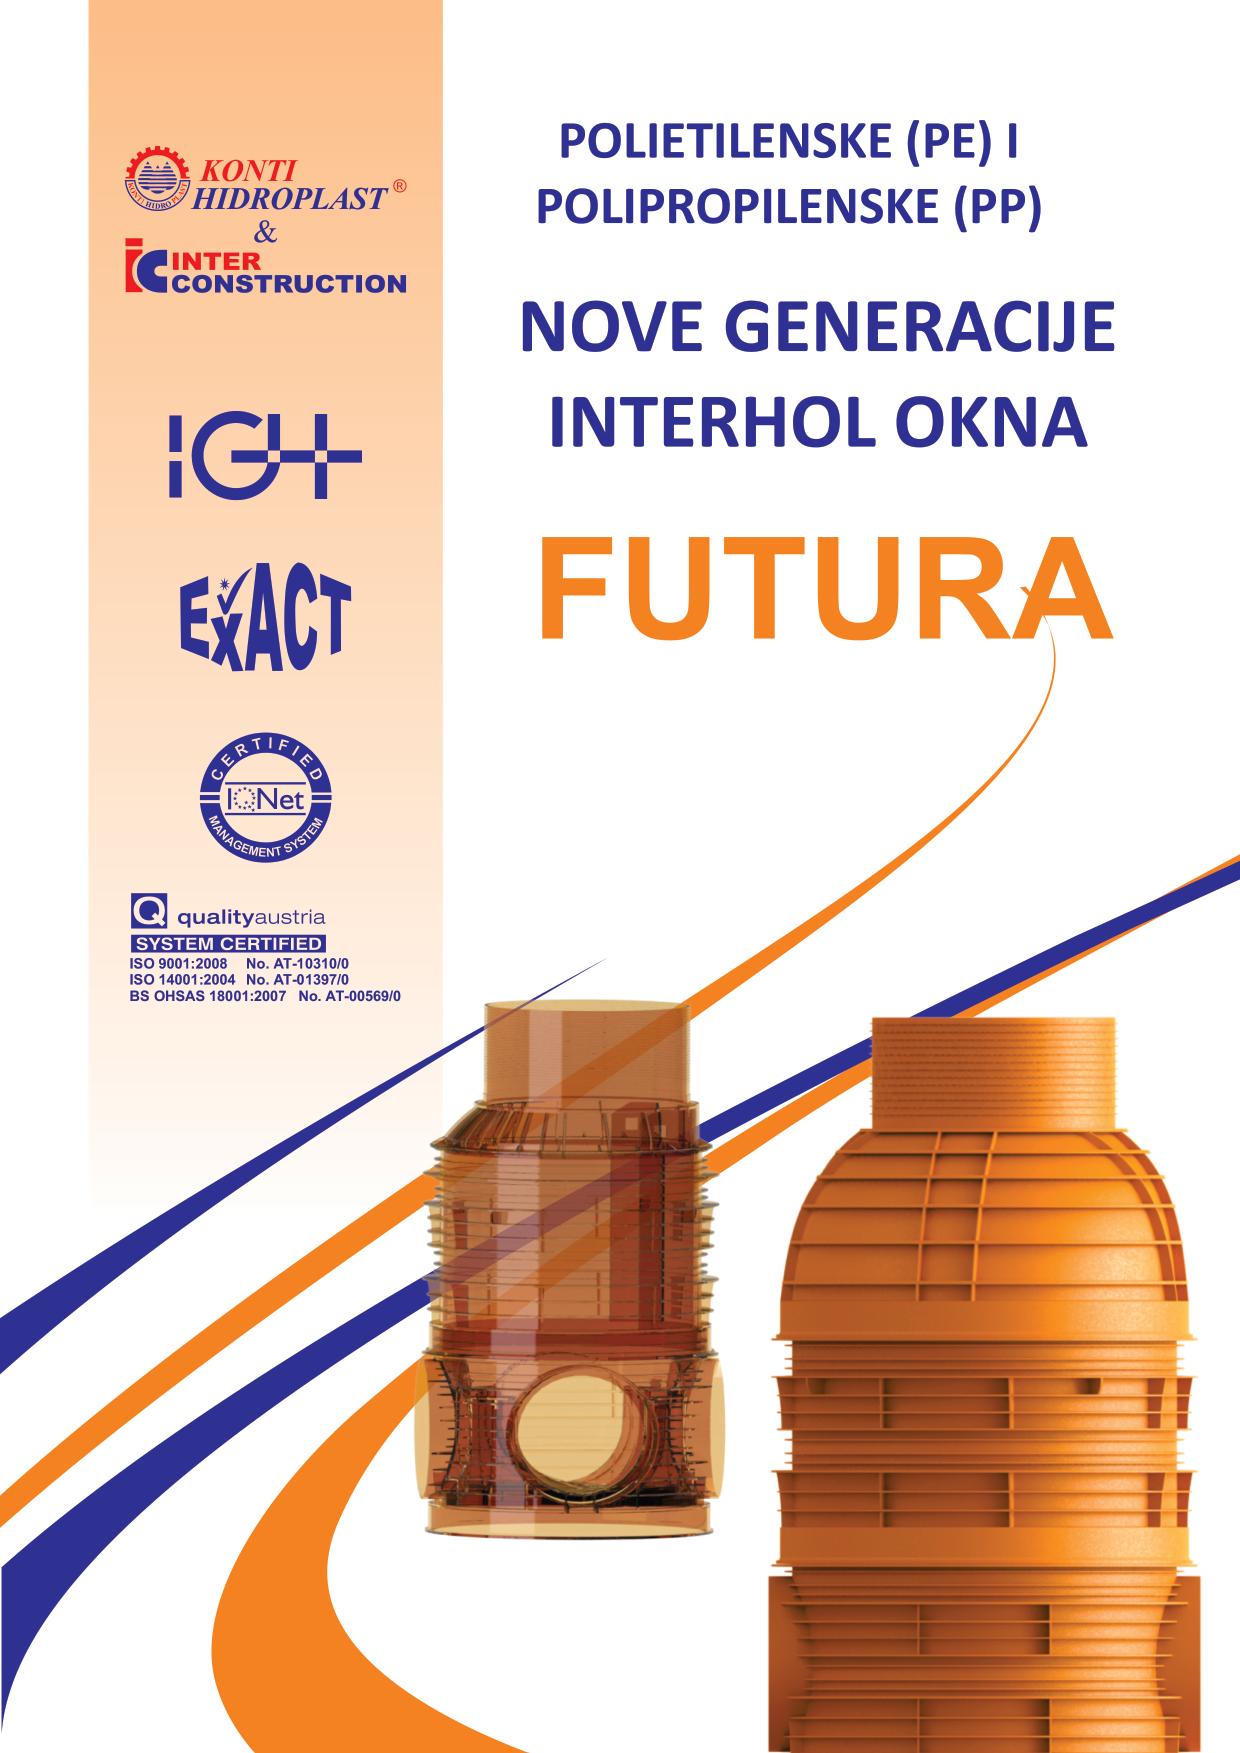 futura manhole futura okno brochure dn1000 dn800 dn600 dn400